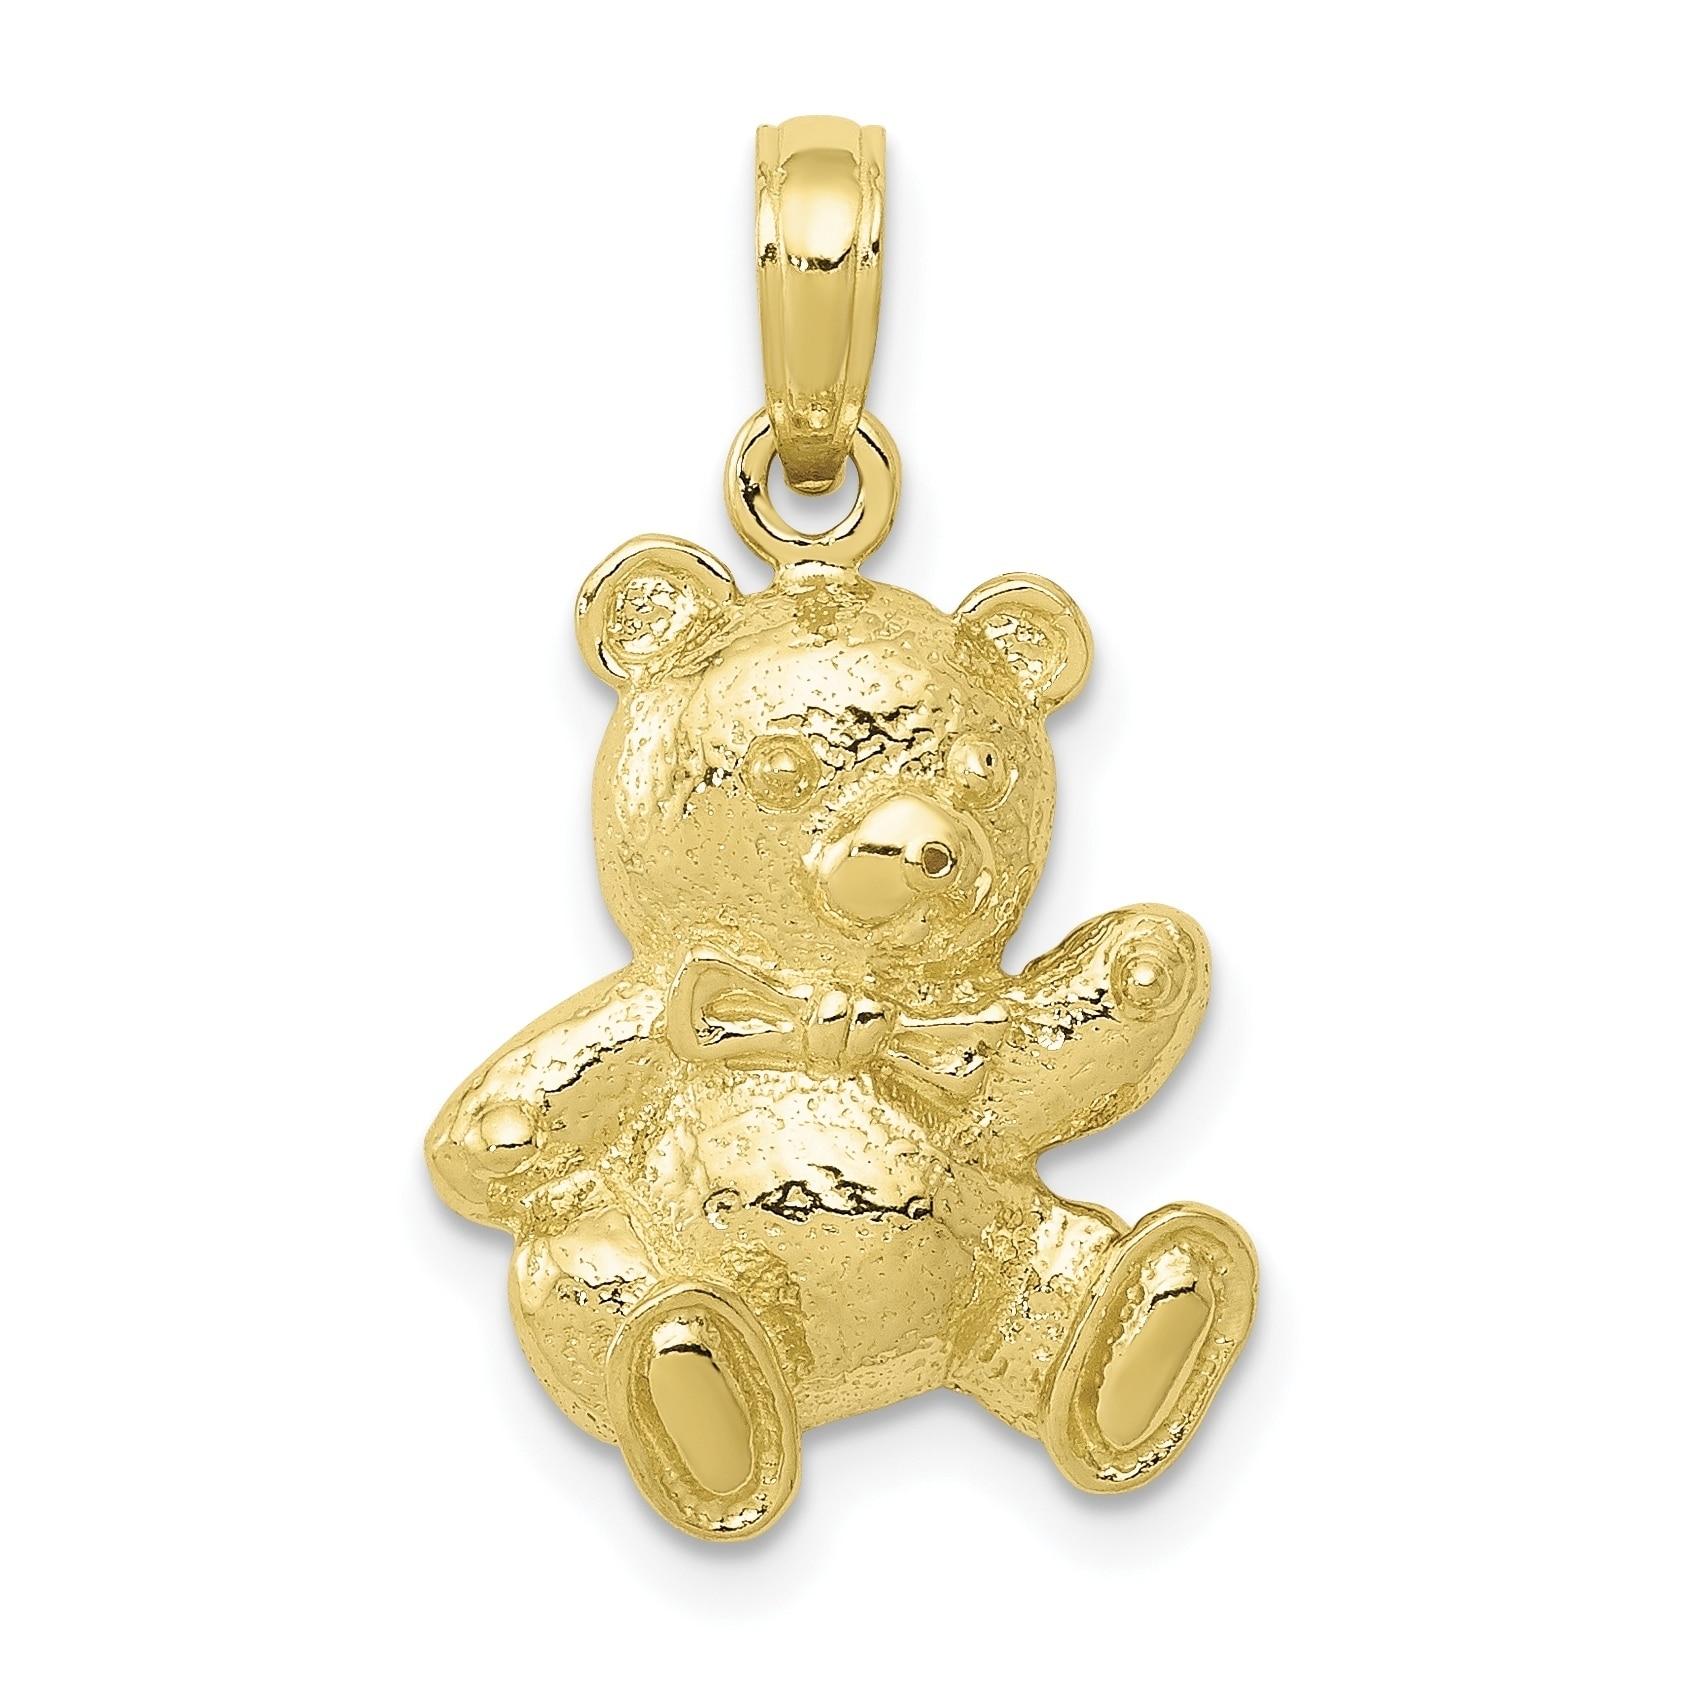 FB Jewels Solid 14K Yellow Gold Satin Diamond-cut SuNFLower Pendant